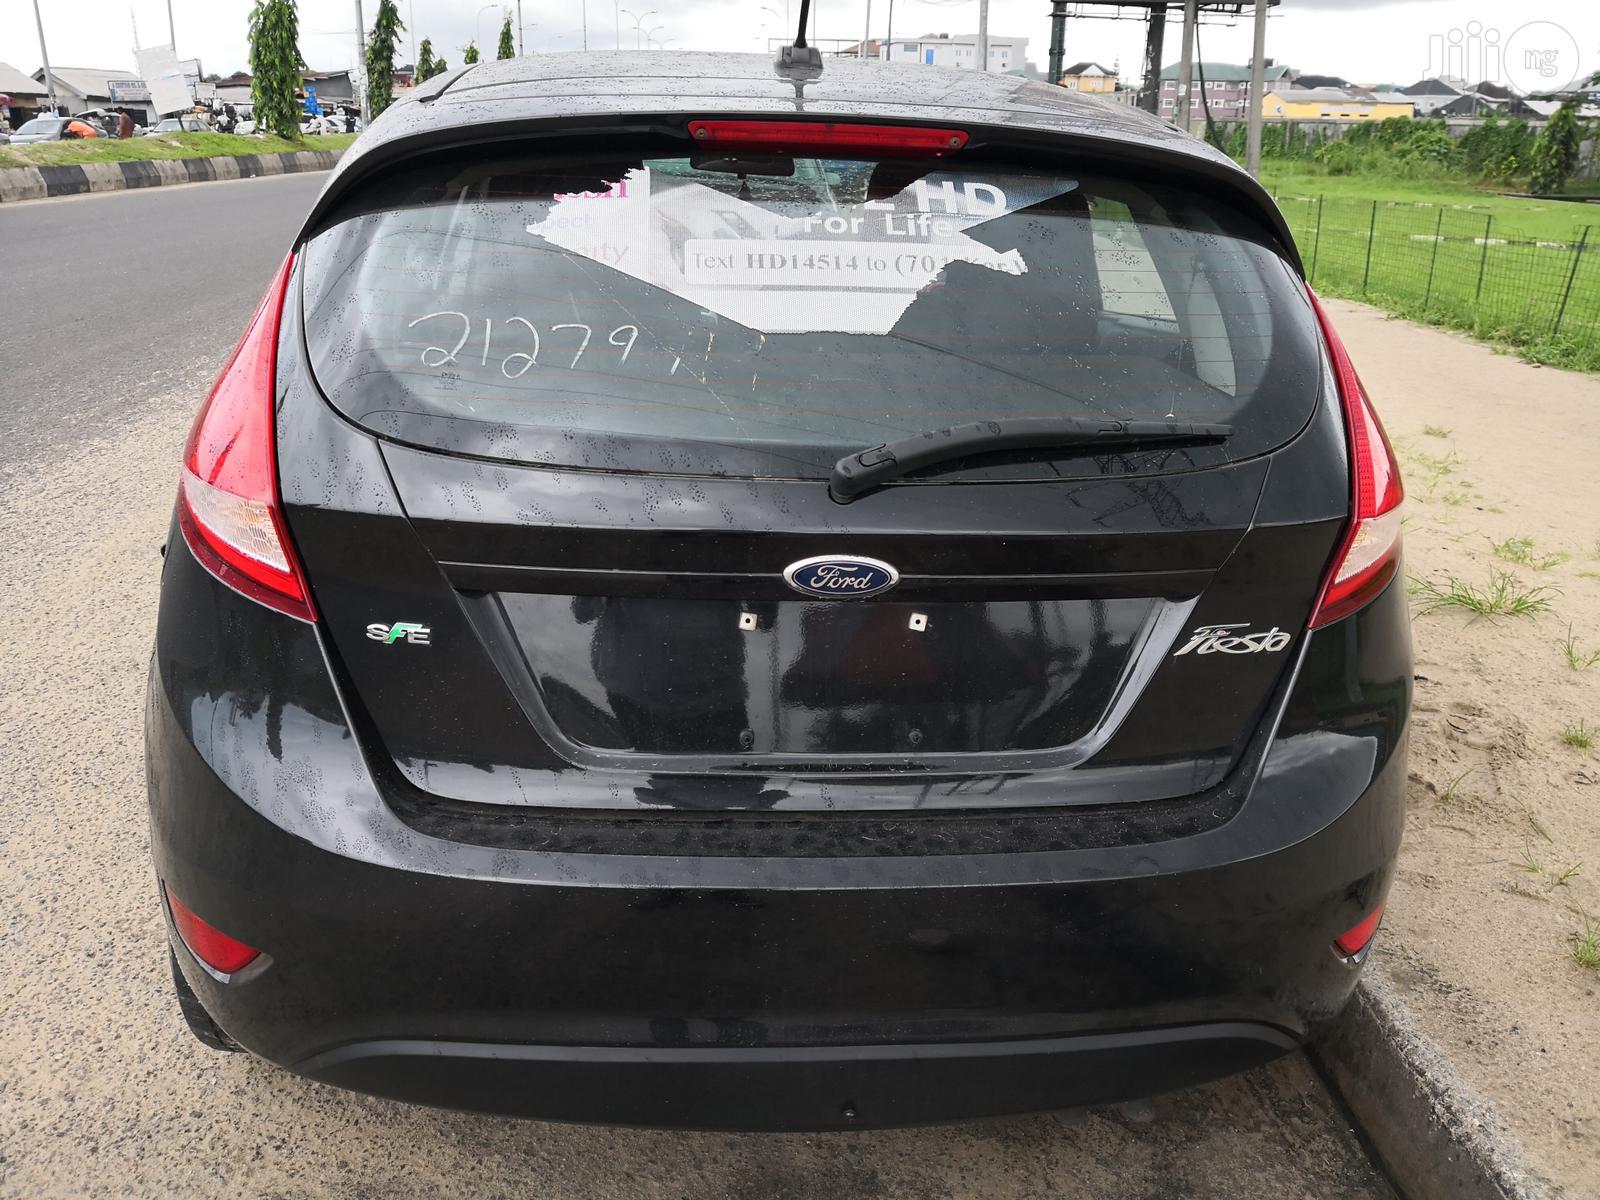 Archive: Ford Fiesta 2012 Black